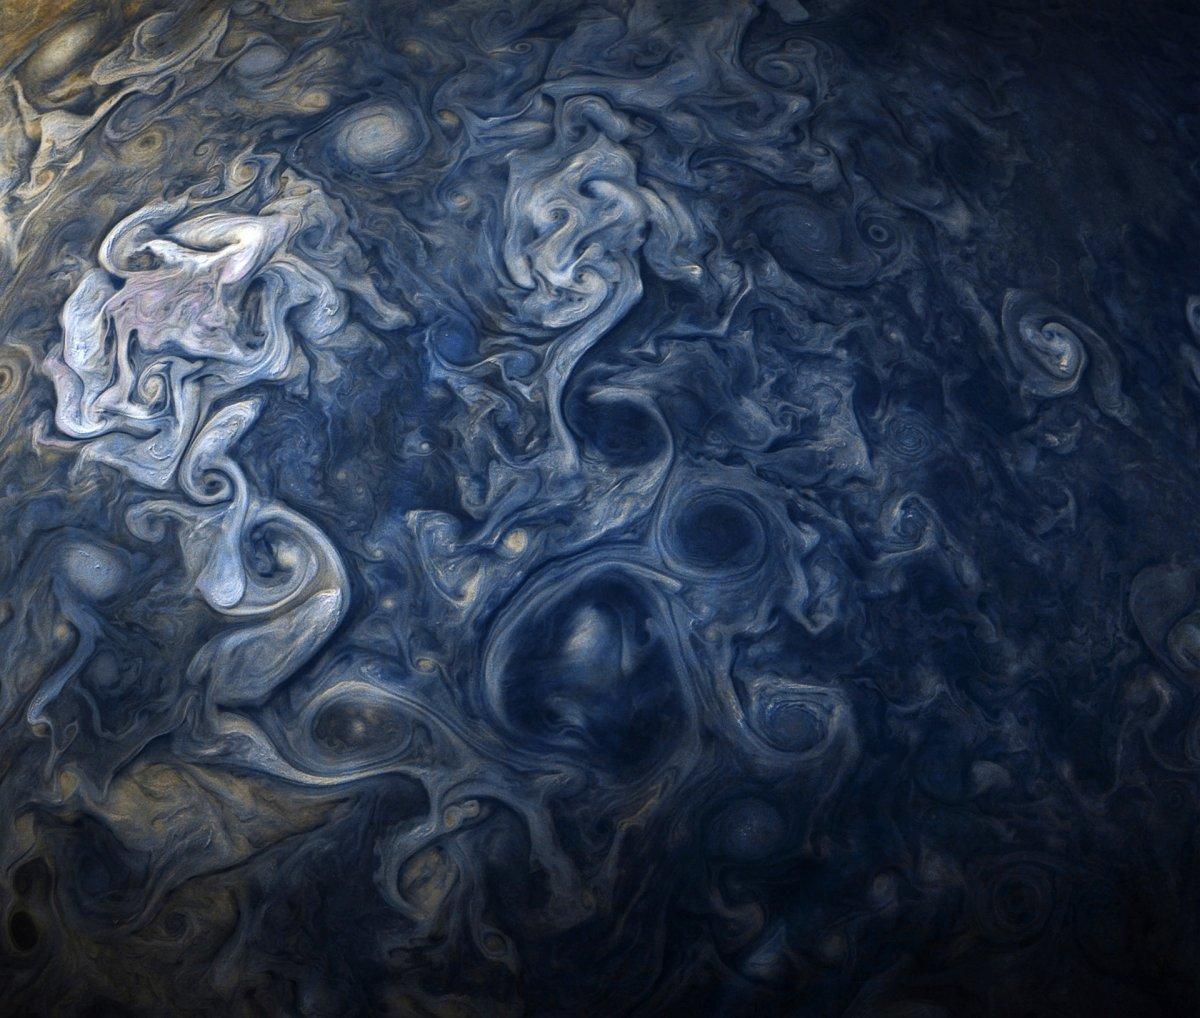 Зонд NASA сразил снимками облаков Юпитера, сходных накартины Ван Гога,